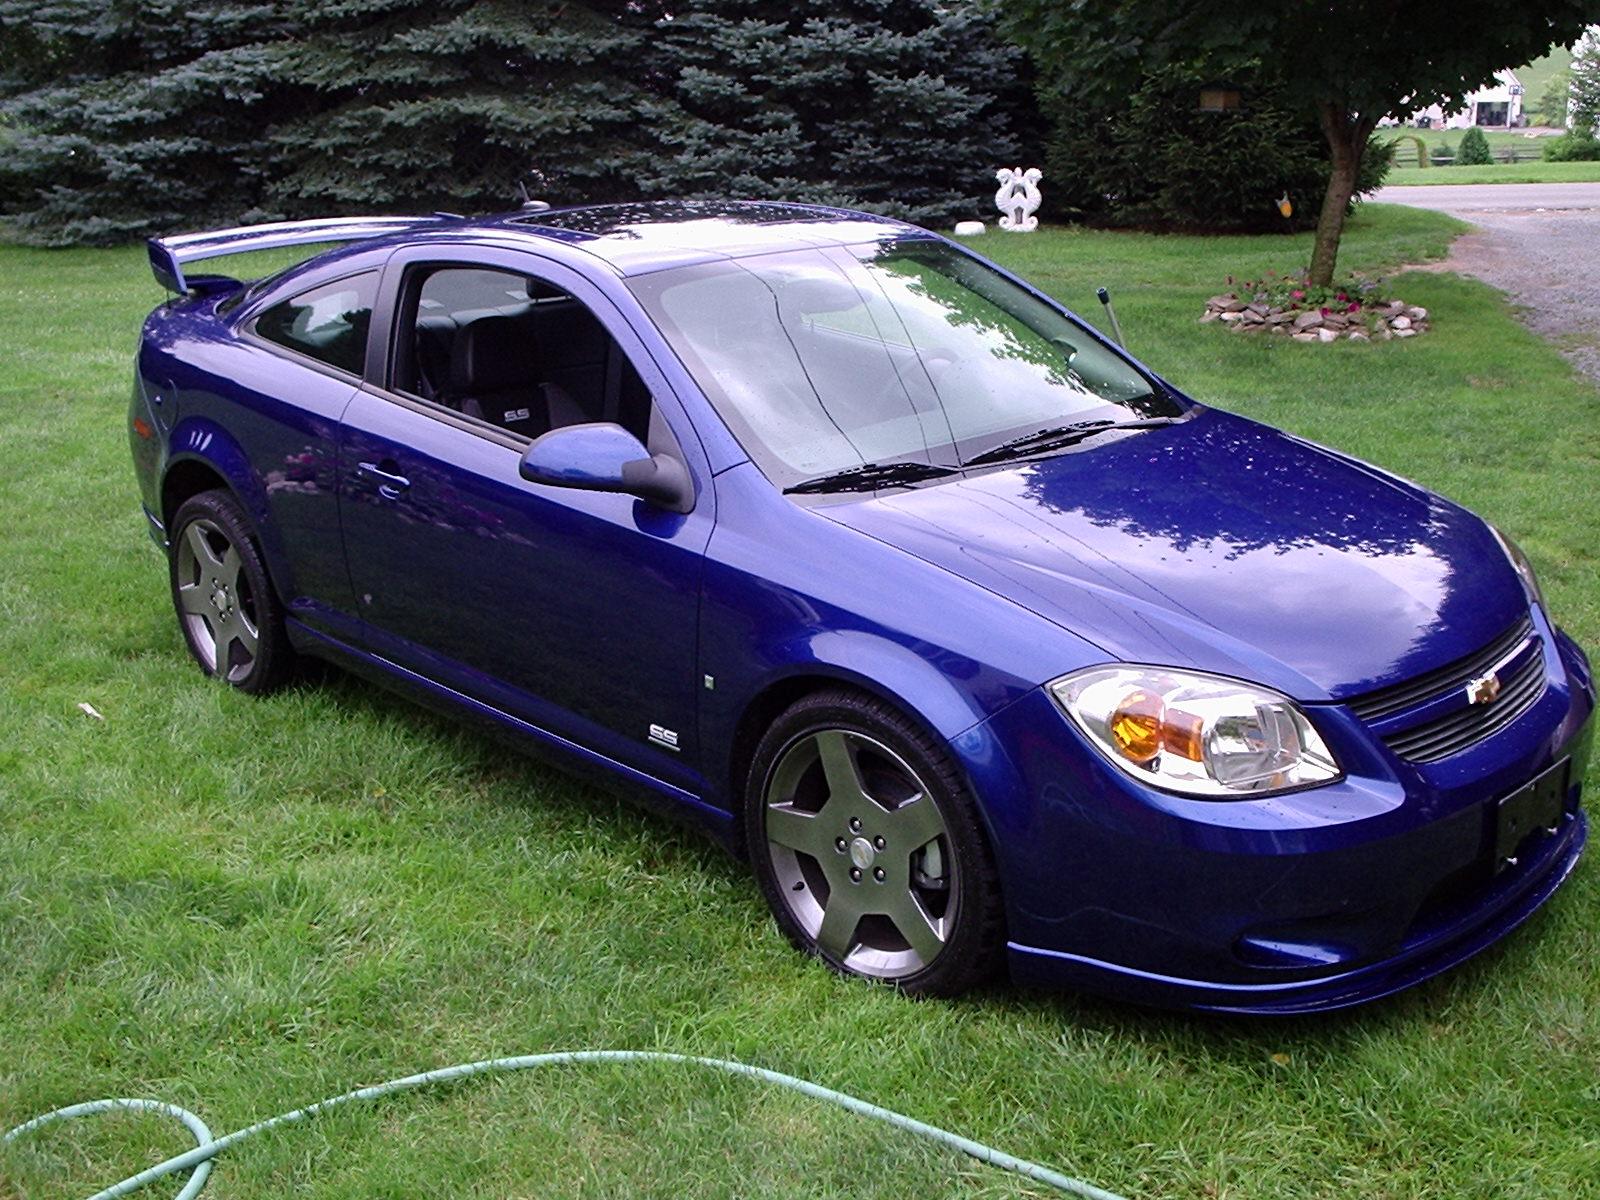 Chevrolet Cobalt Ss Picture 7 Reviews News Specs Buy Car